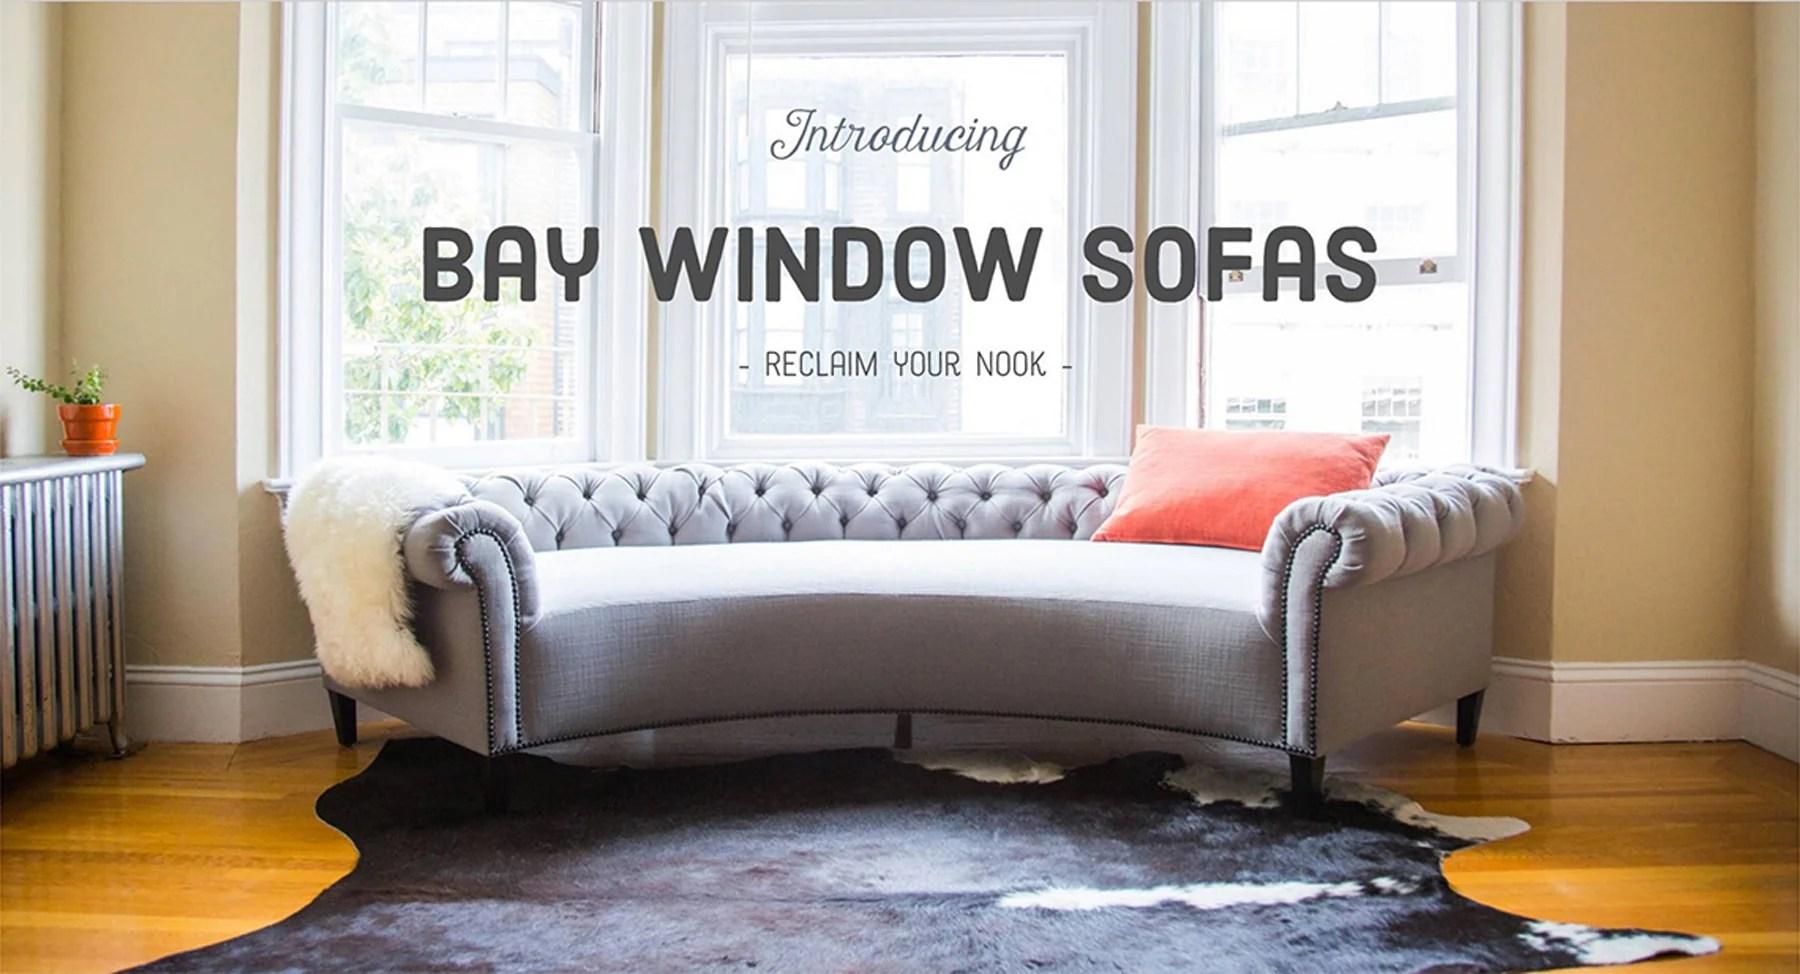 bay sofa dfs sophia review window sofas